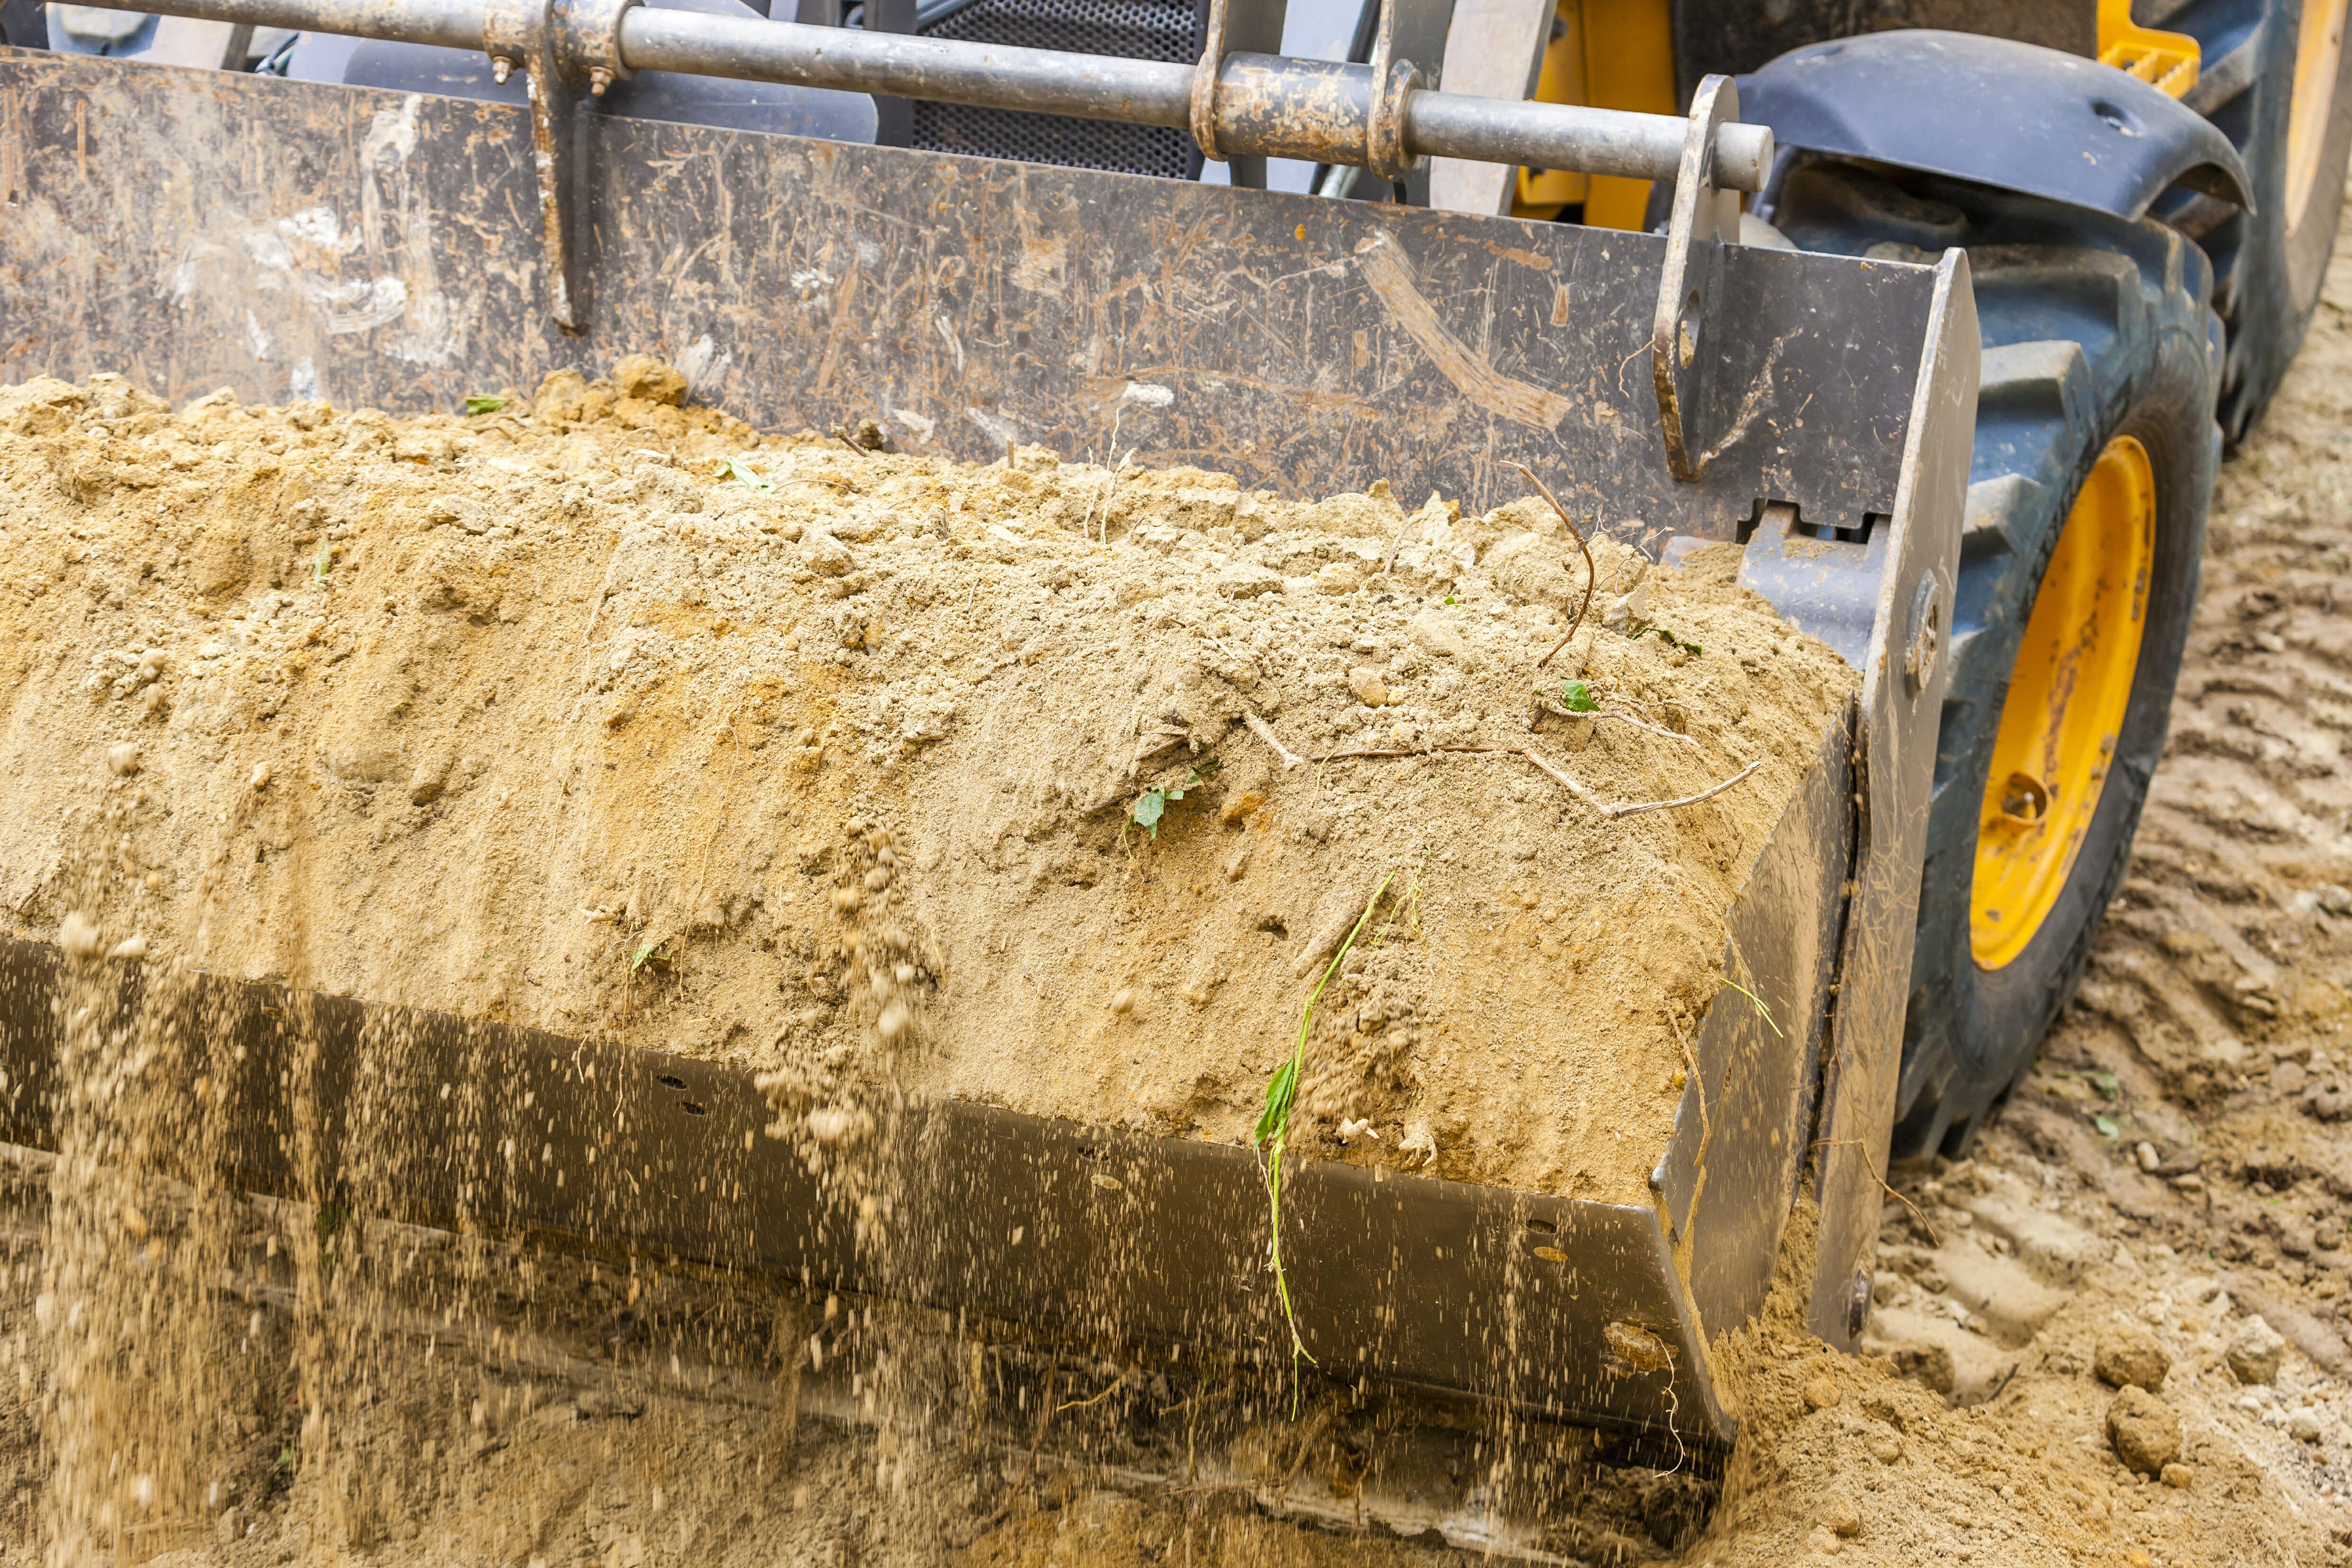 Soil in tractor bucket